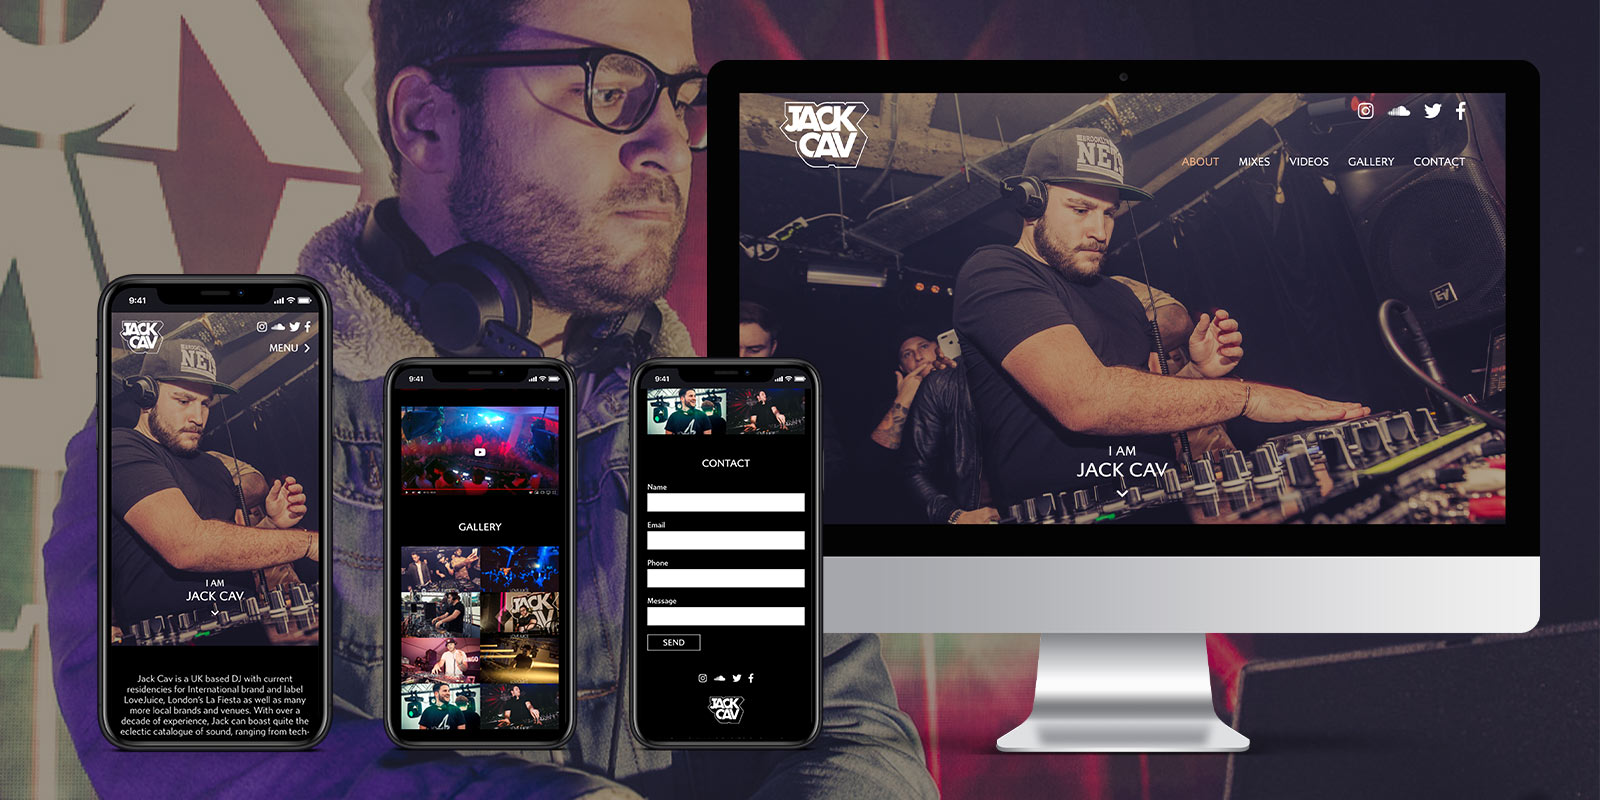 Jack Cav - Website Design by Atom Creative Media